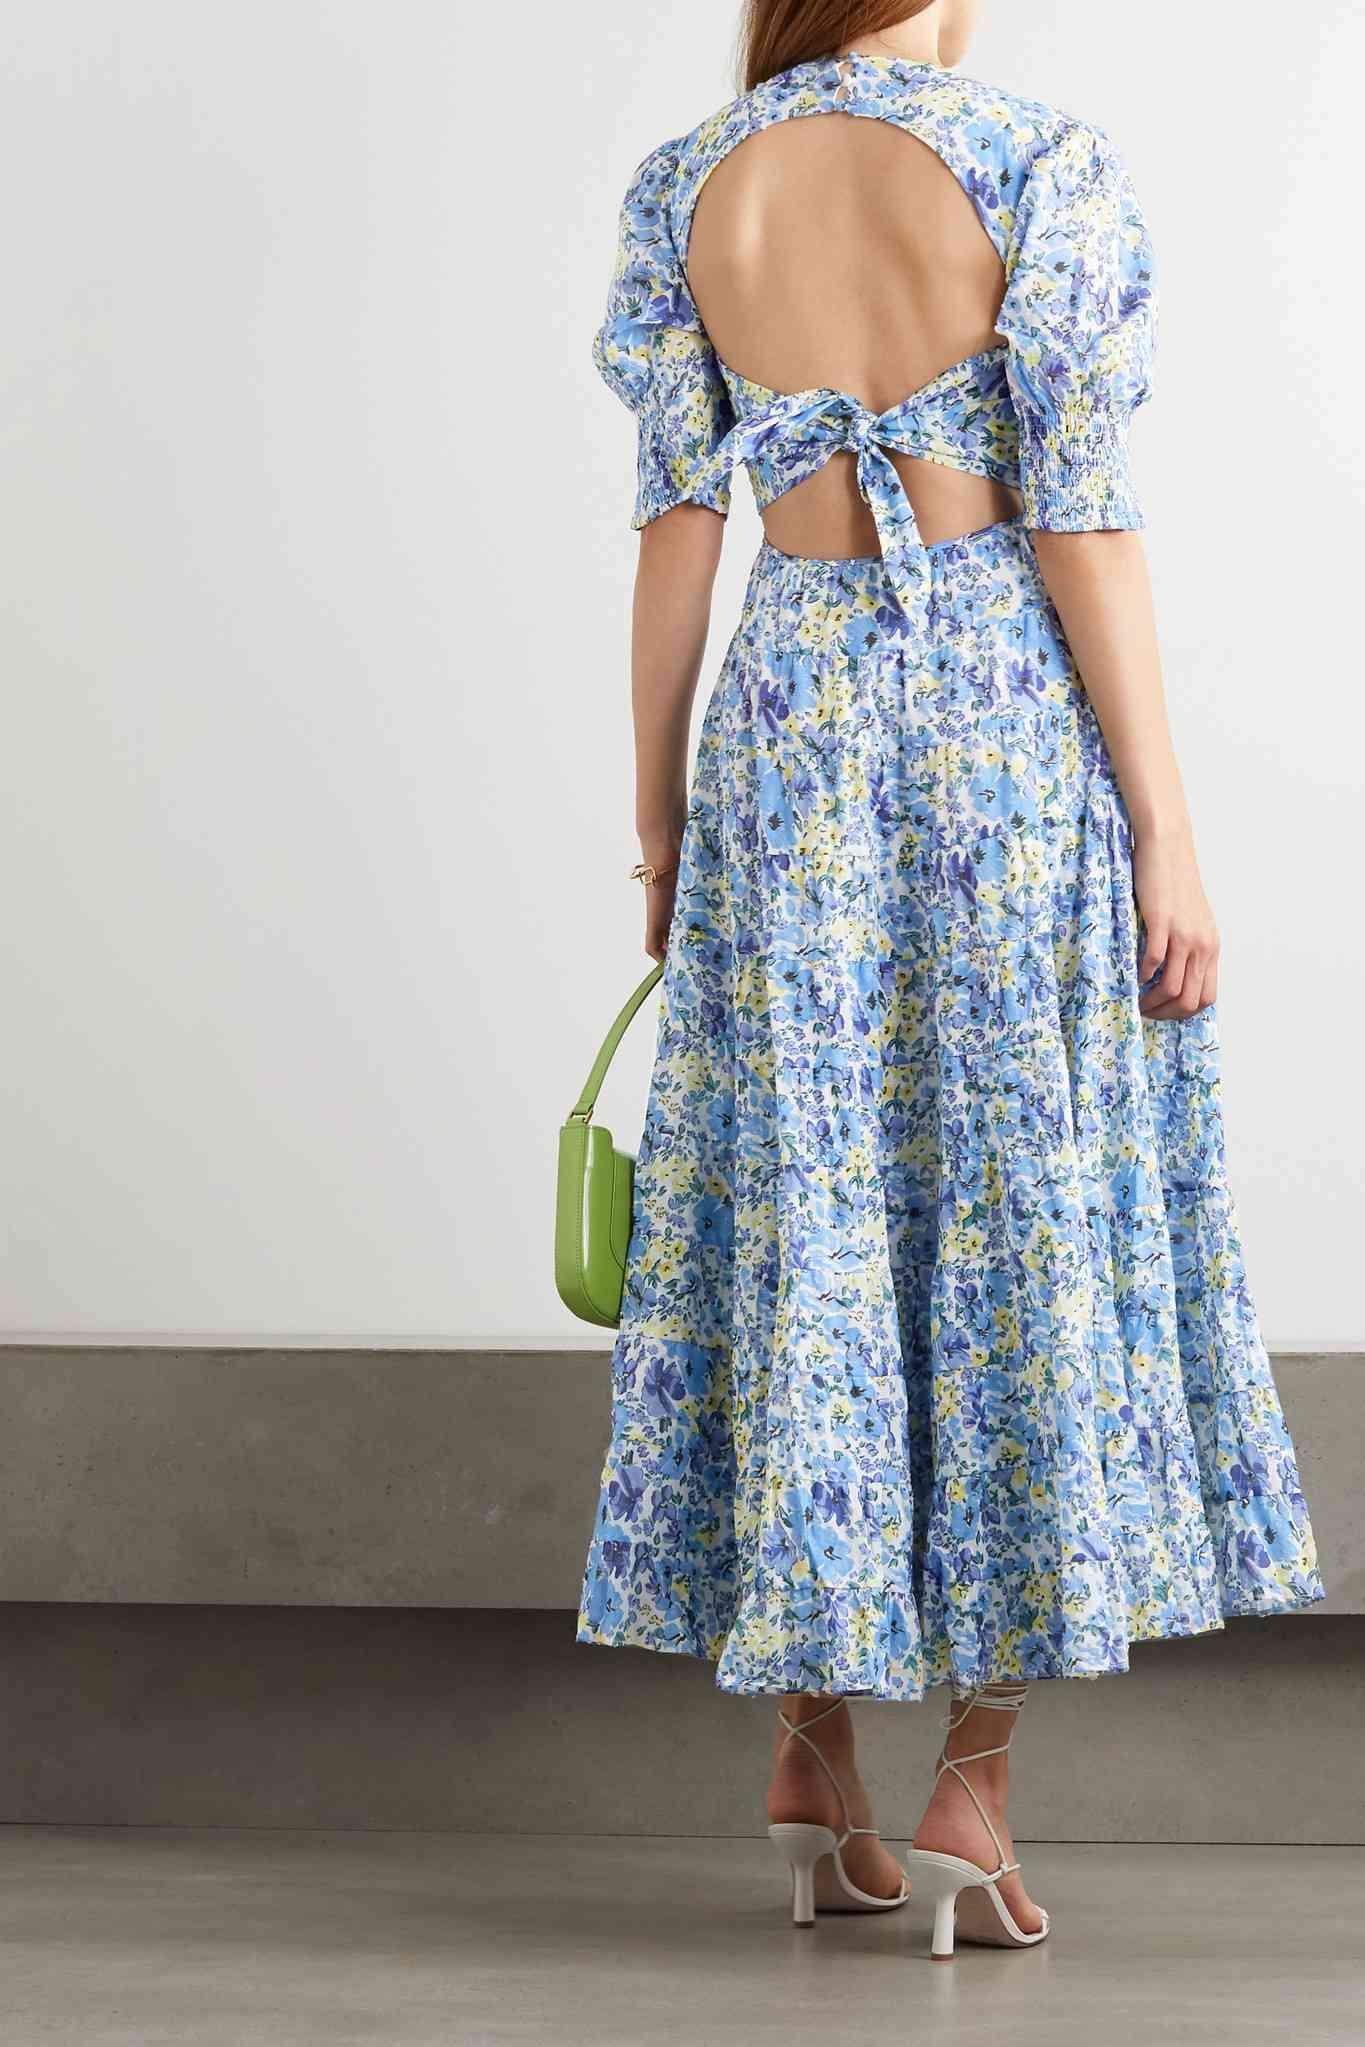 Rixo Agyness Cutout Tiered Floral-Print Fil Coupé Cotton Maxi Dress $164 (originally $410)